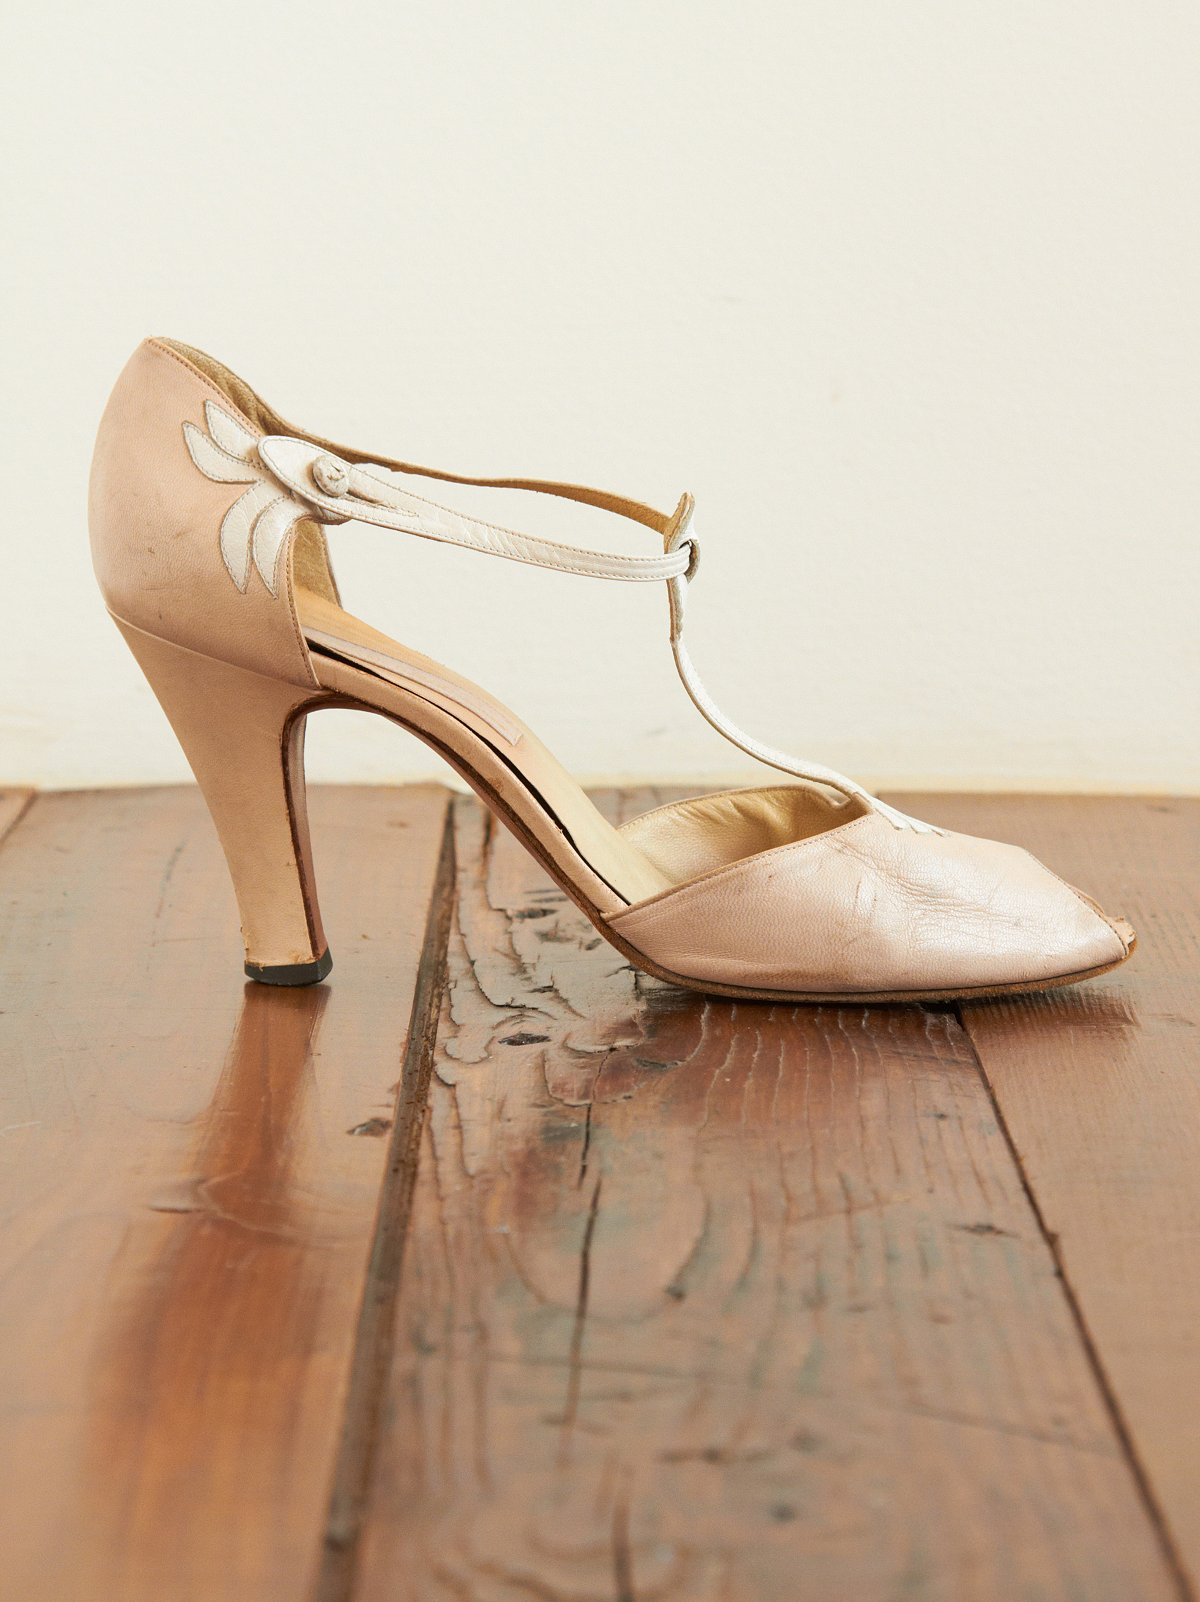 Vintage Joan and David T-strap Heels